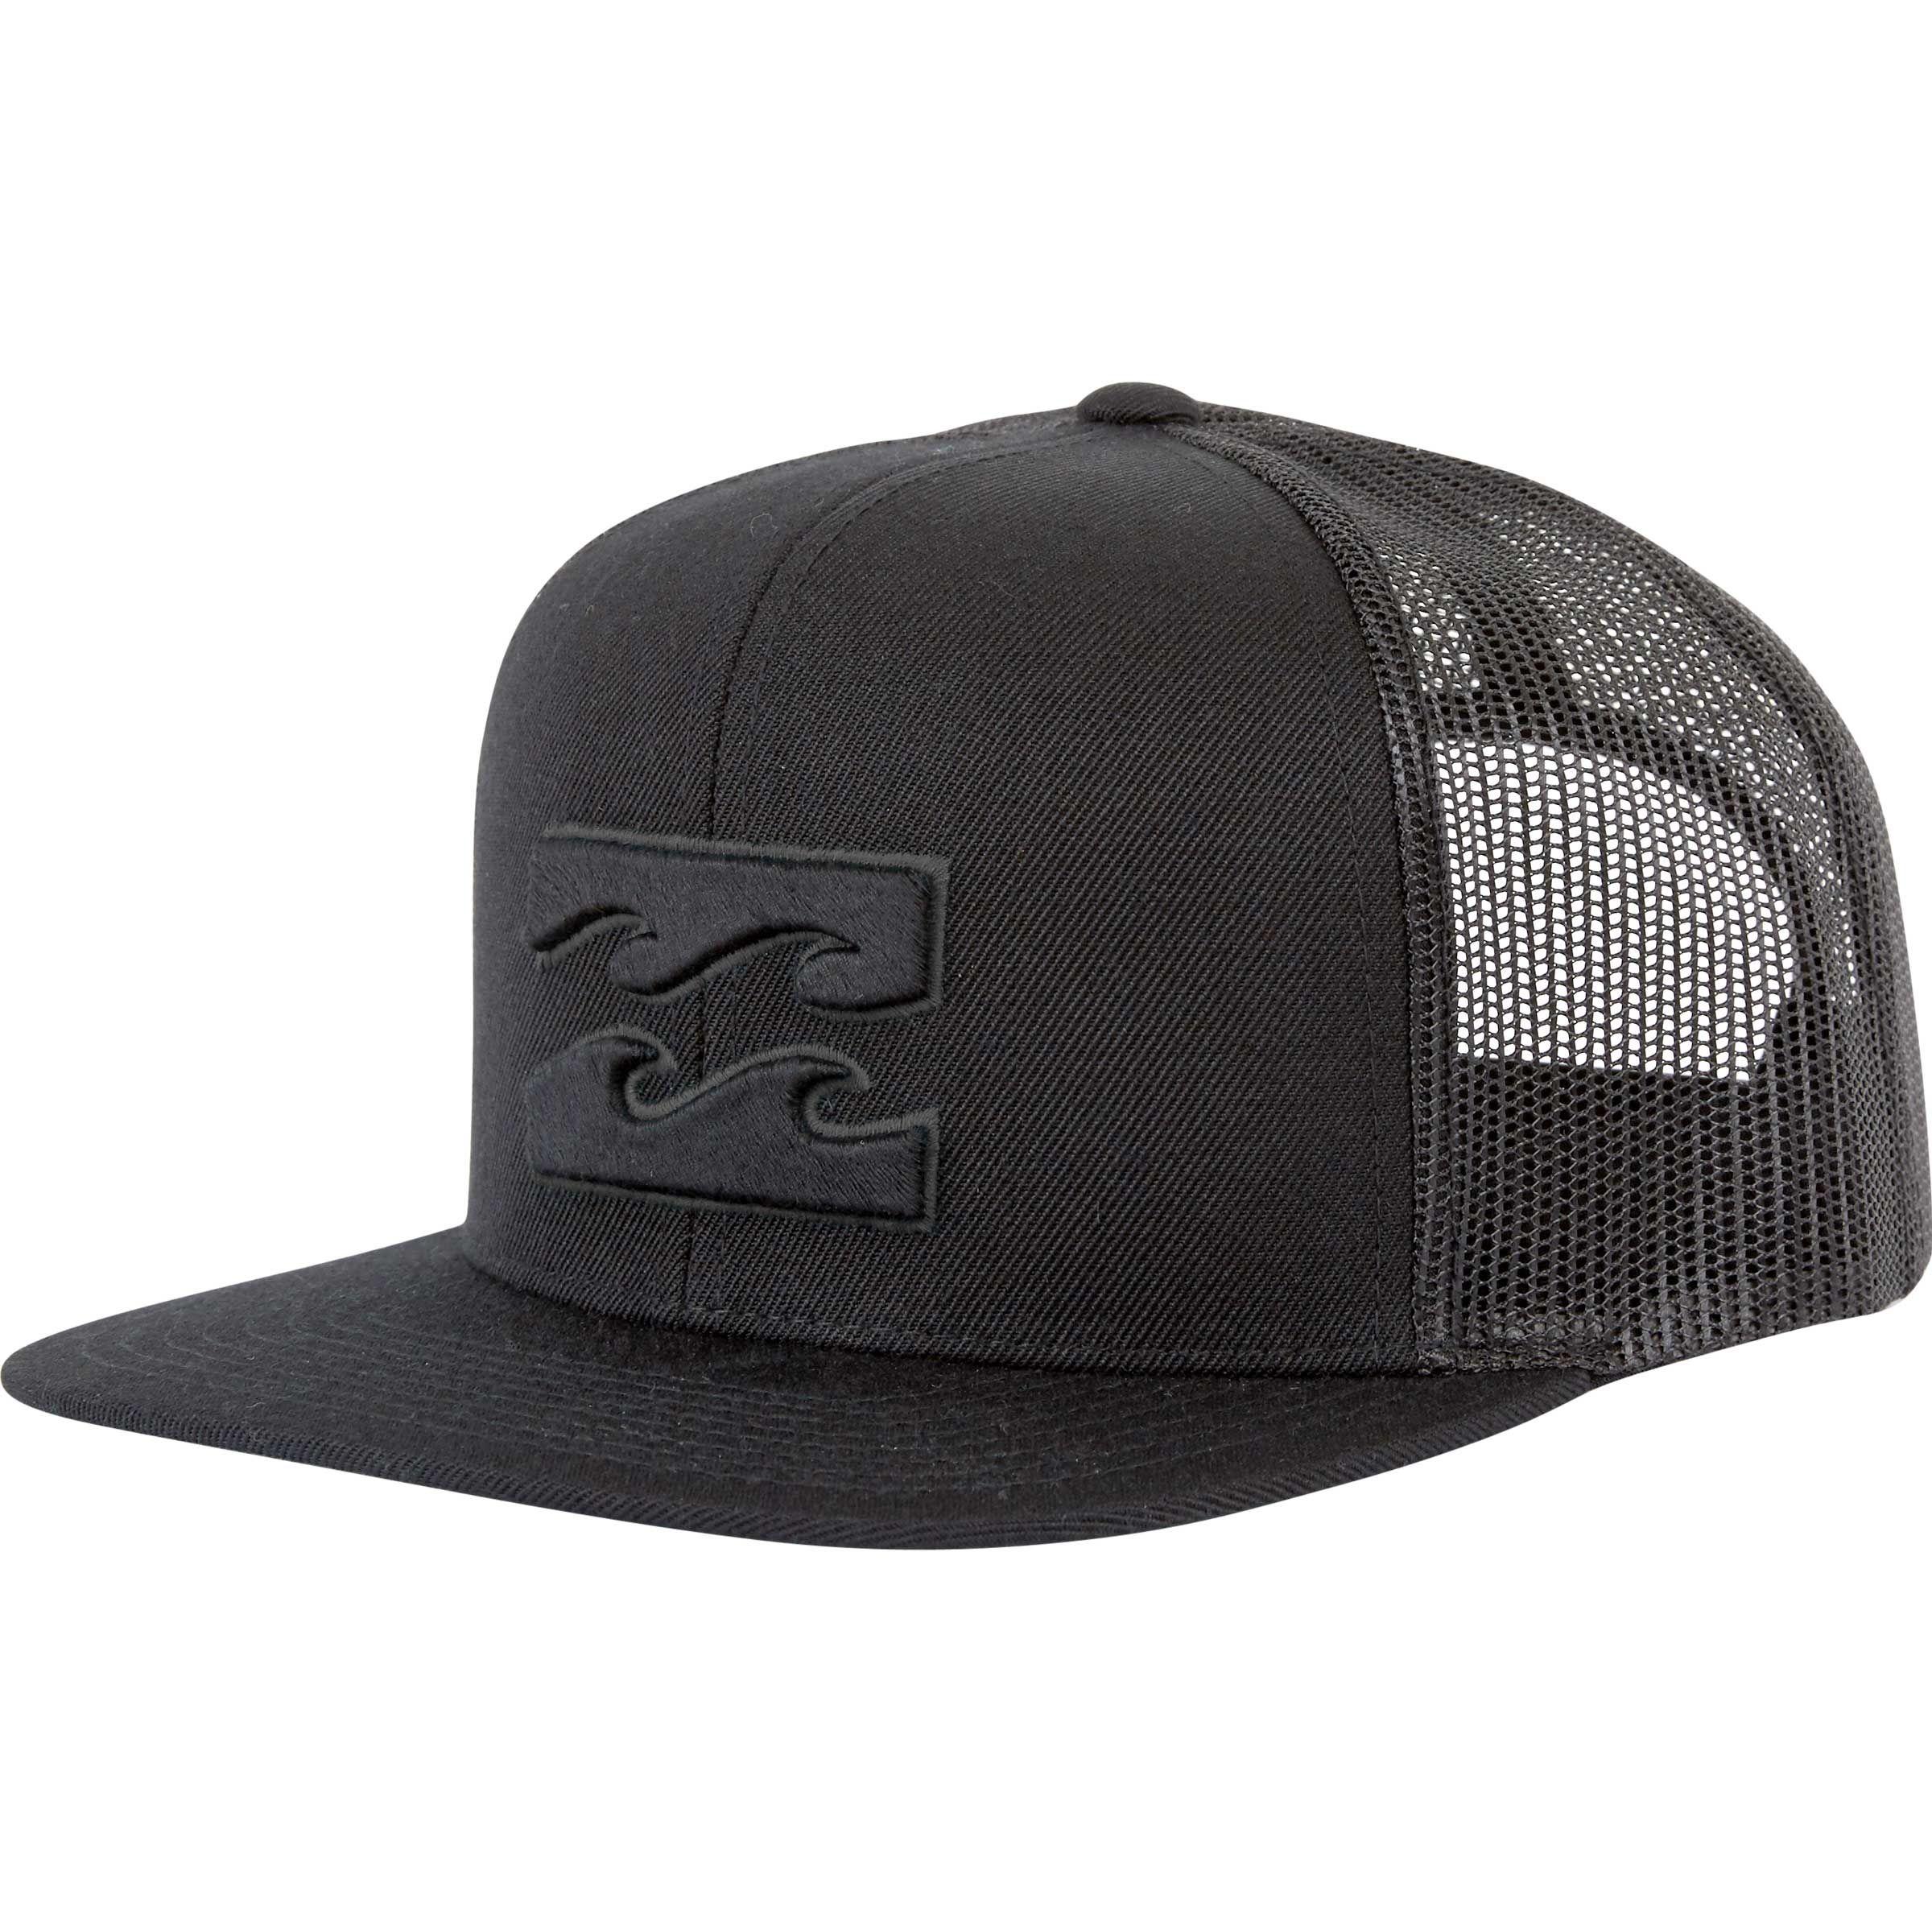 New Rip Curl Staple Grey Mens Snapback Cap Hat